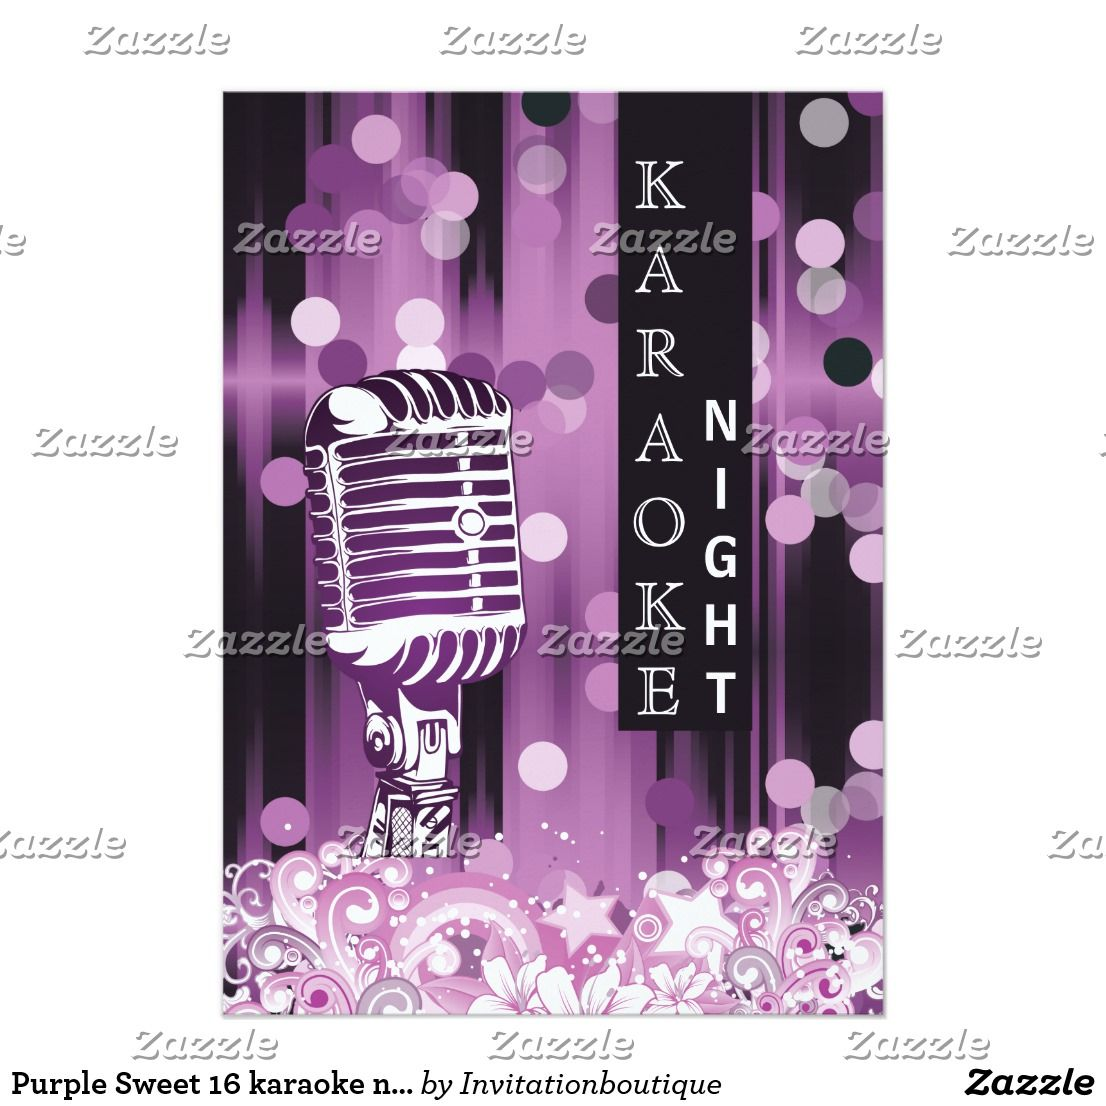 Purple sweet 16 karaoke night party invitation invitation cards purple sweet 16 karaoke night party invitation monicamarmolfo Image collections